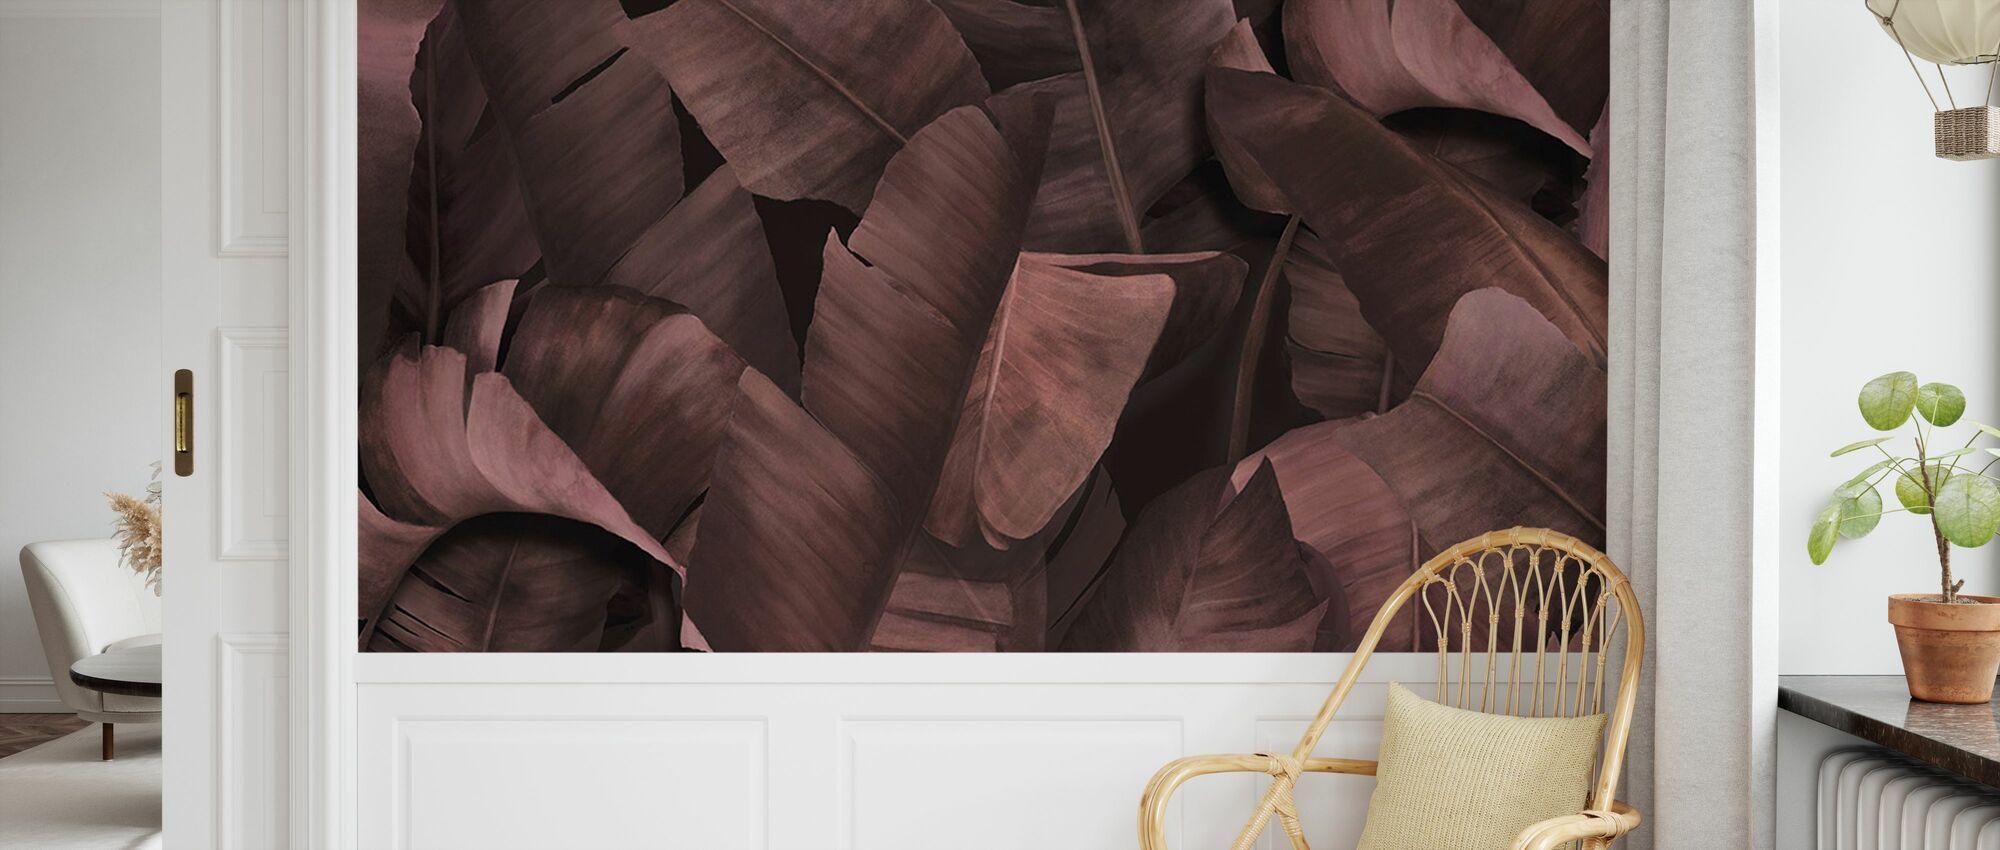 Botany Tropical Dusty Rose - Wallpaper - Kids Room